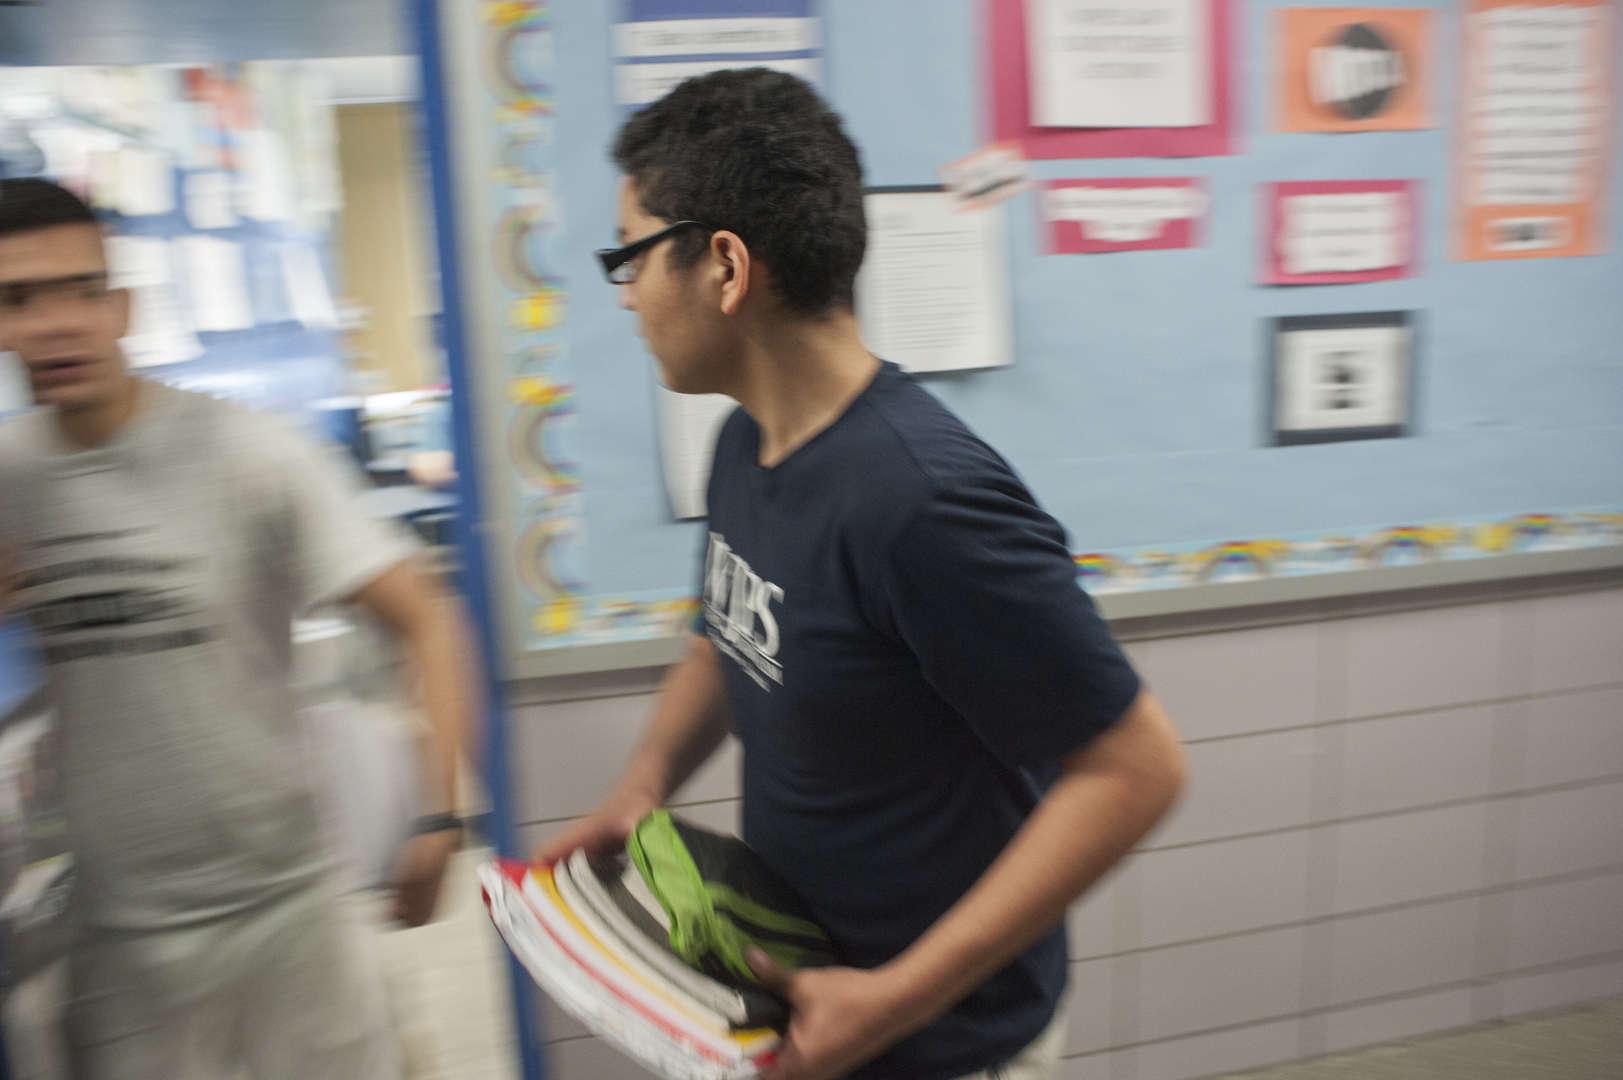 student holding school books